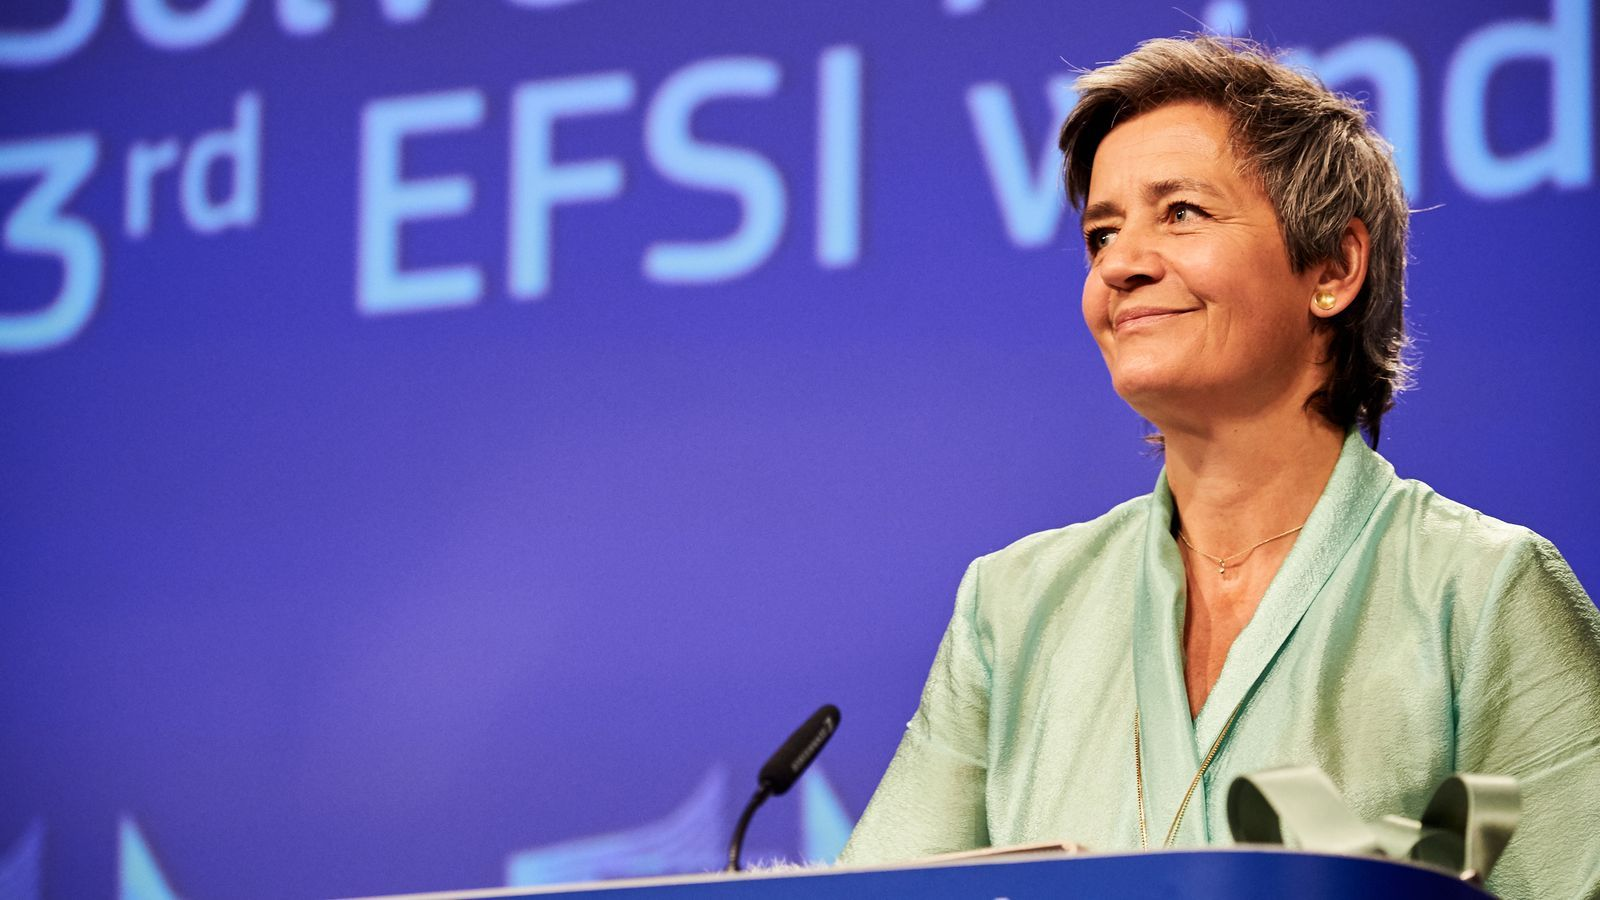 La Comissària europea de Competència, Mergrethe Vestager